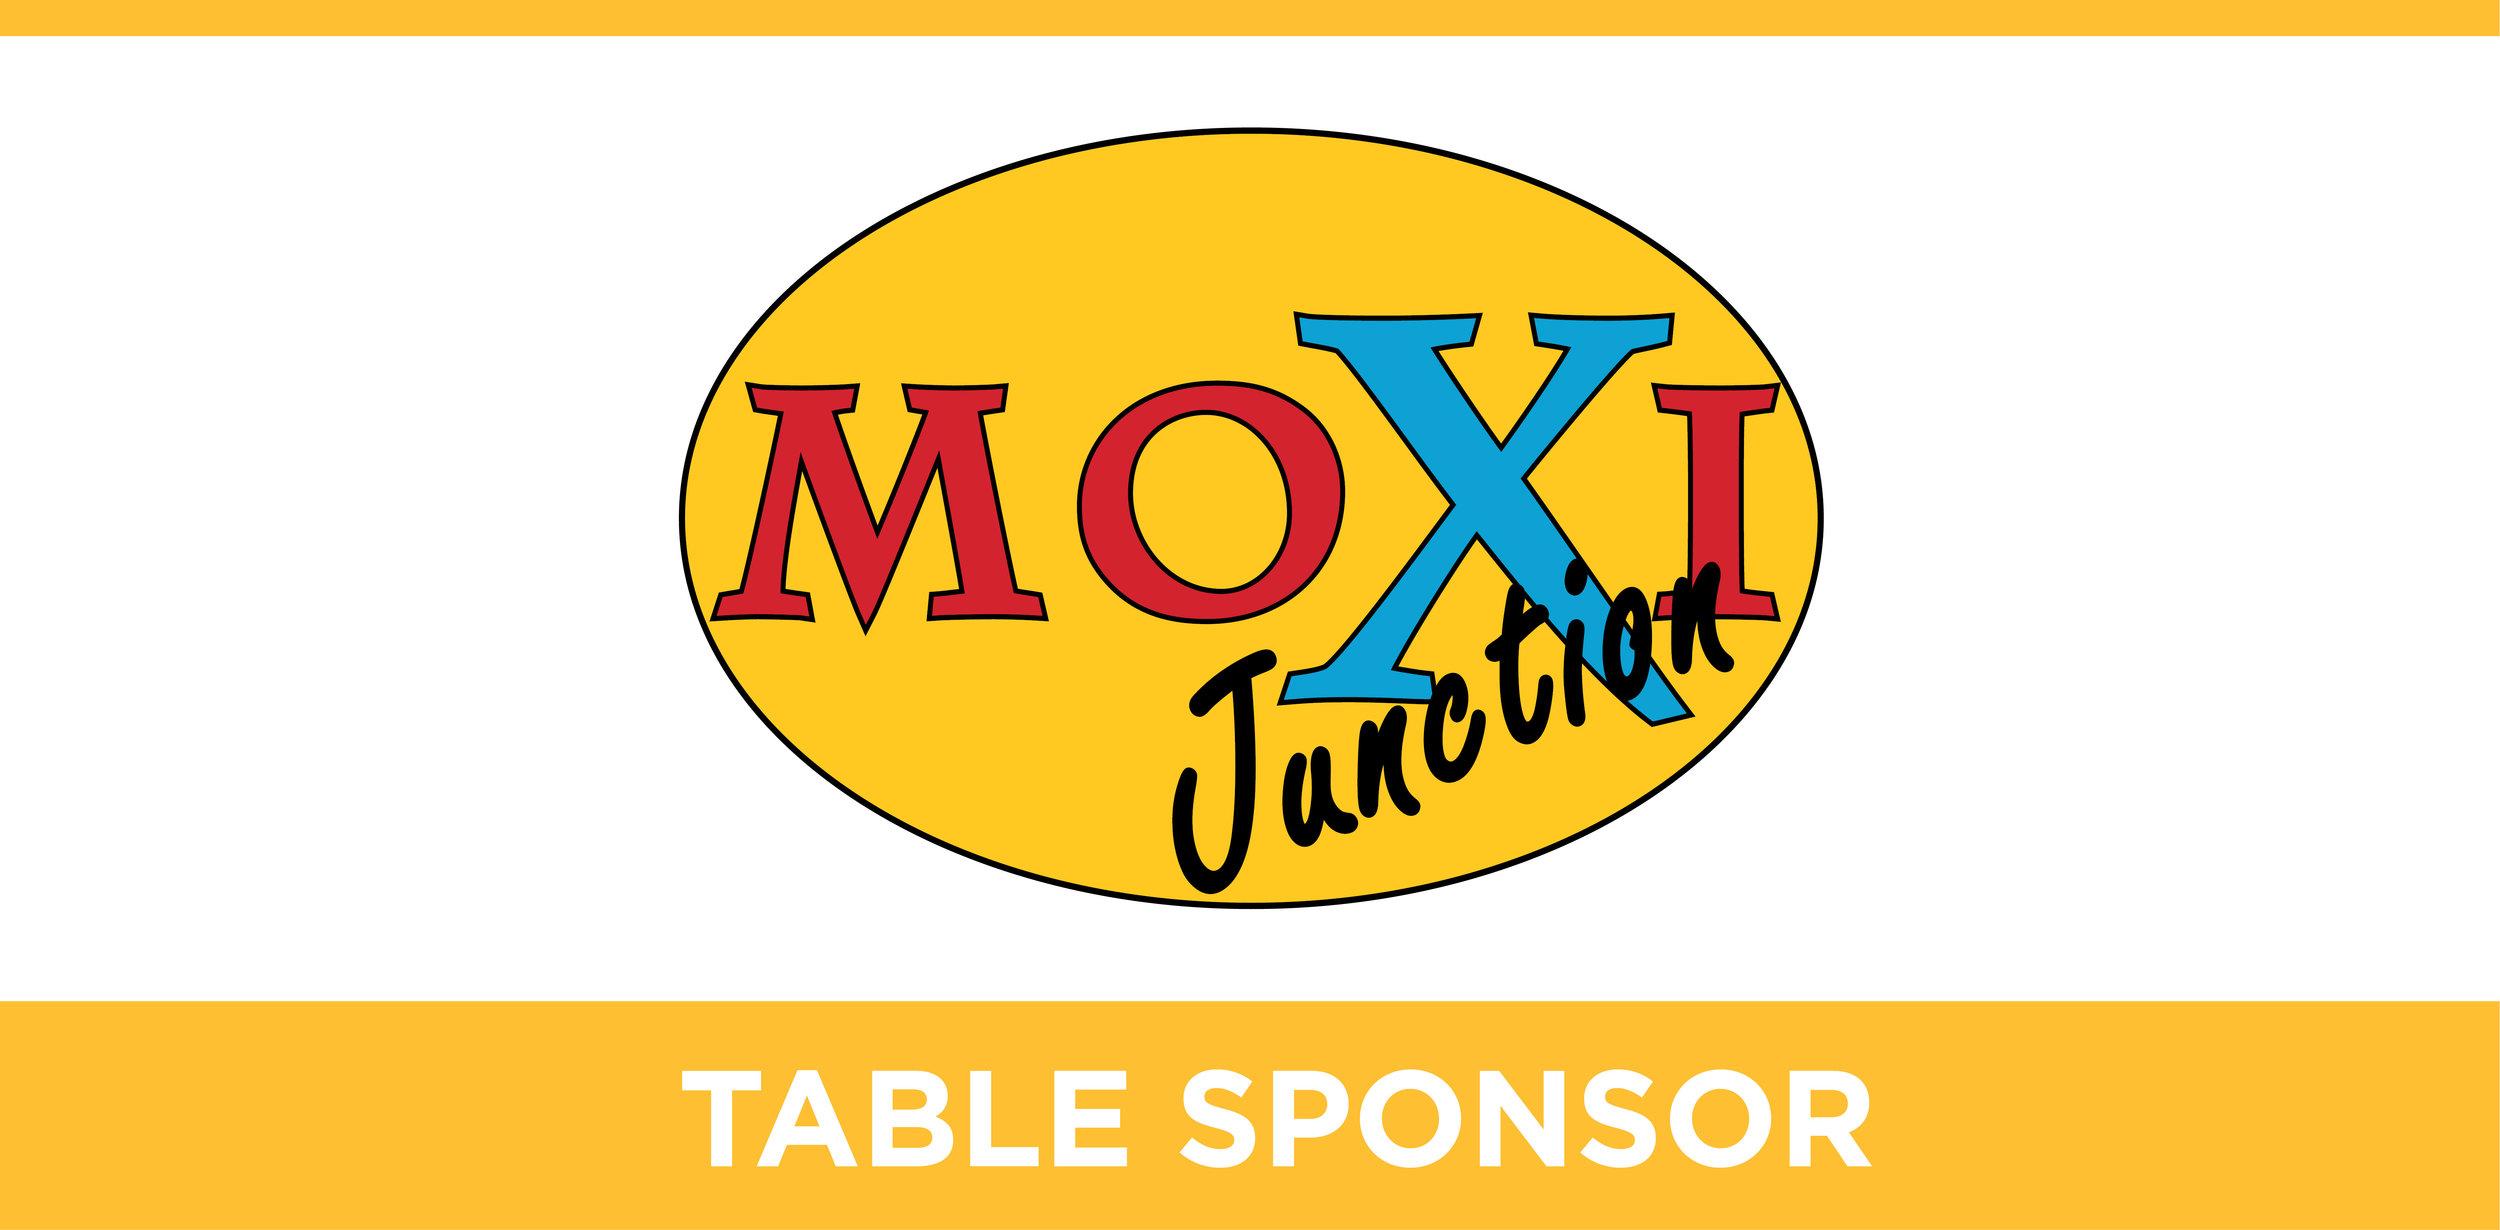 MOXI SBF19 Web Sponsor Sign.jpg